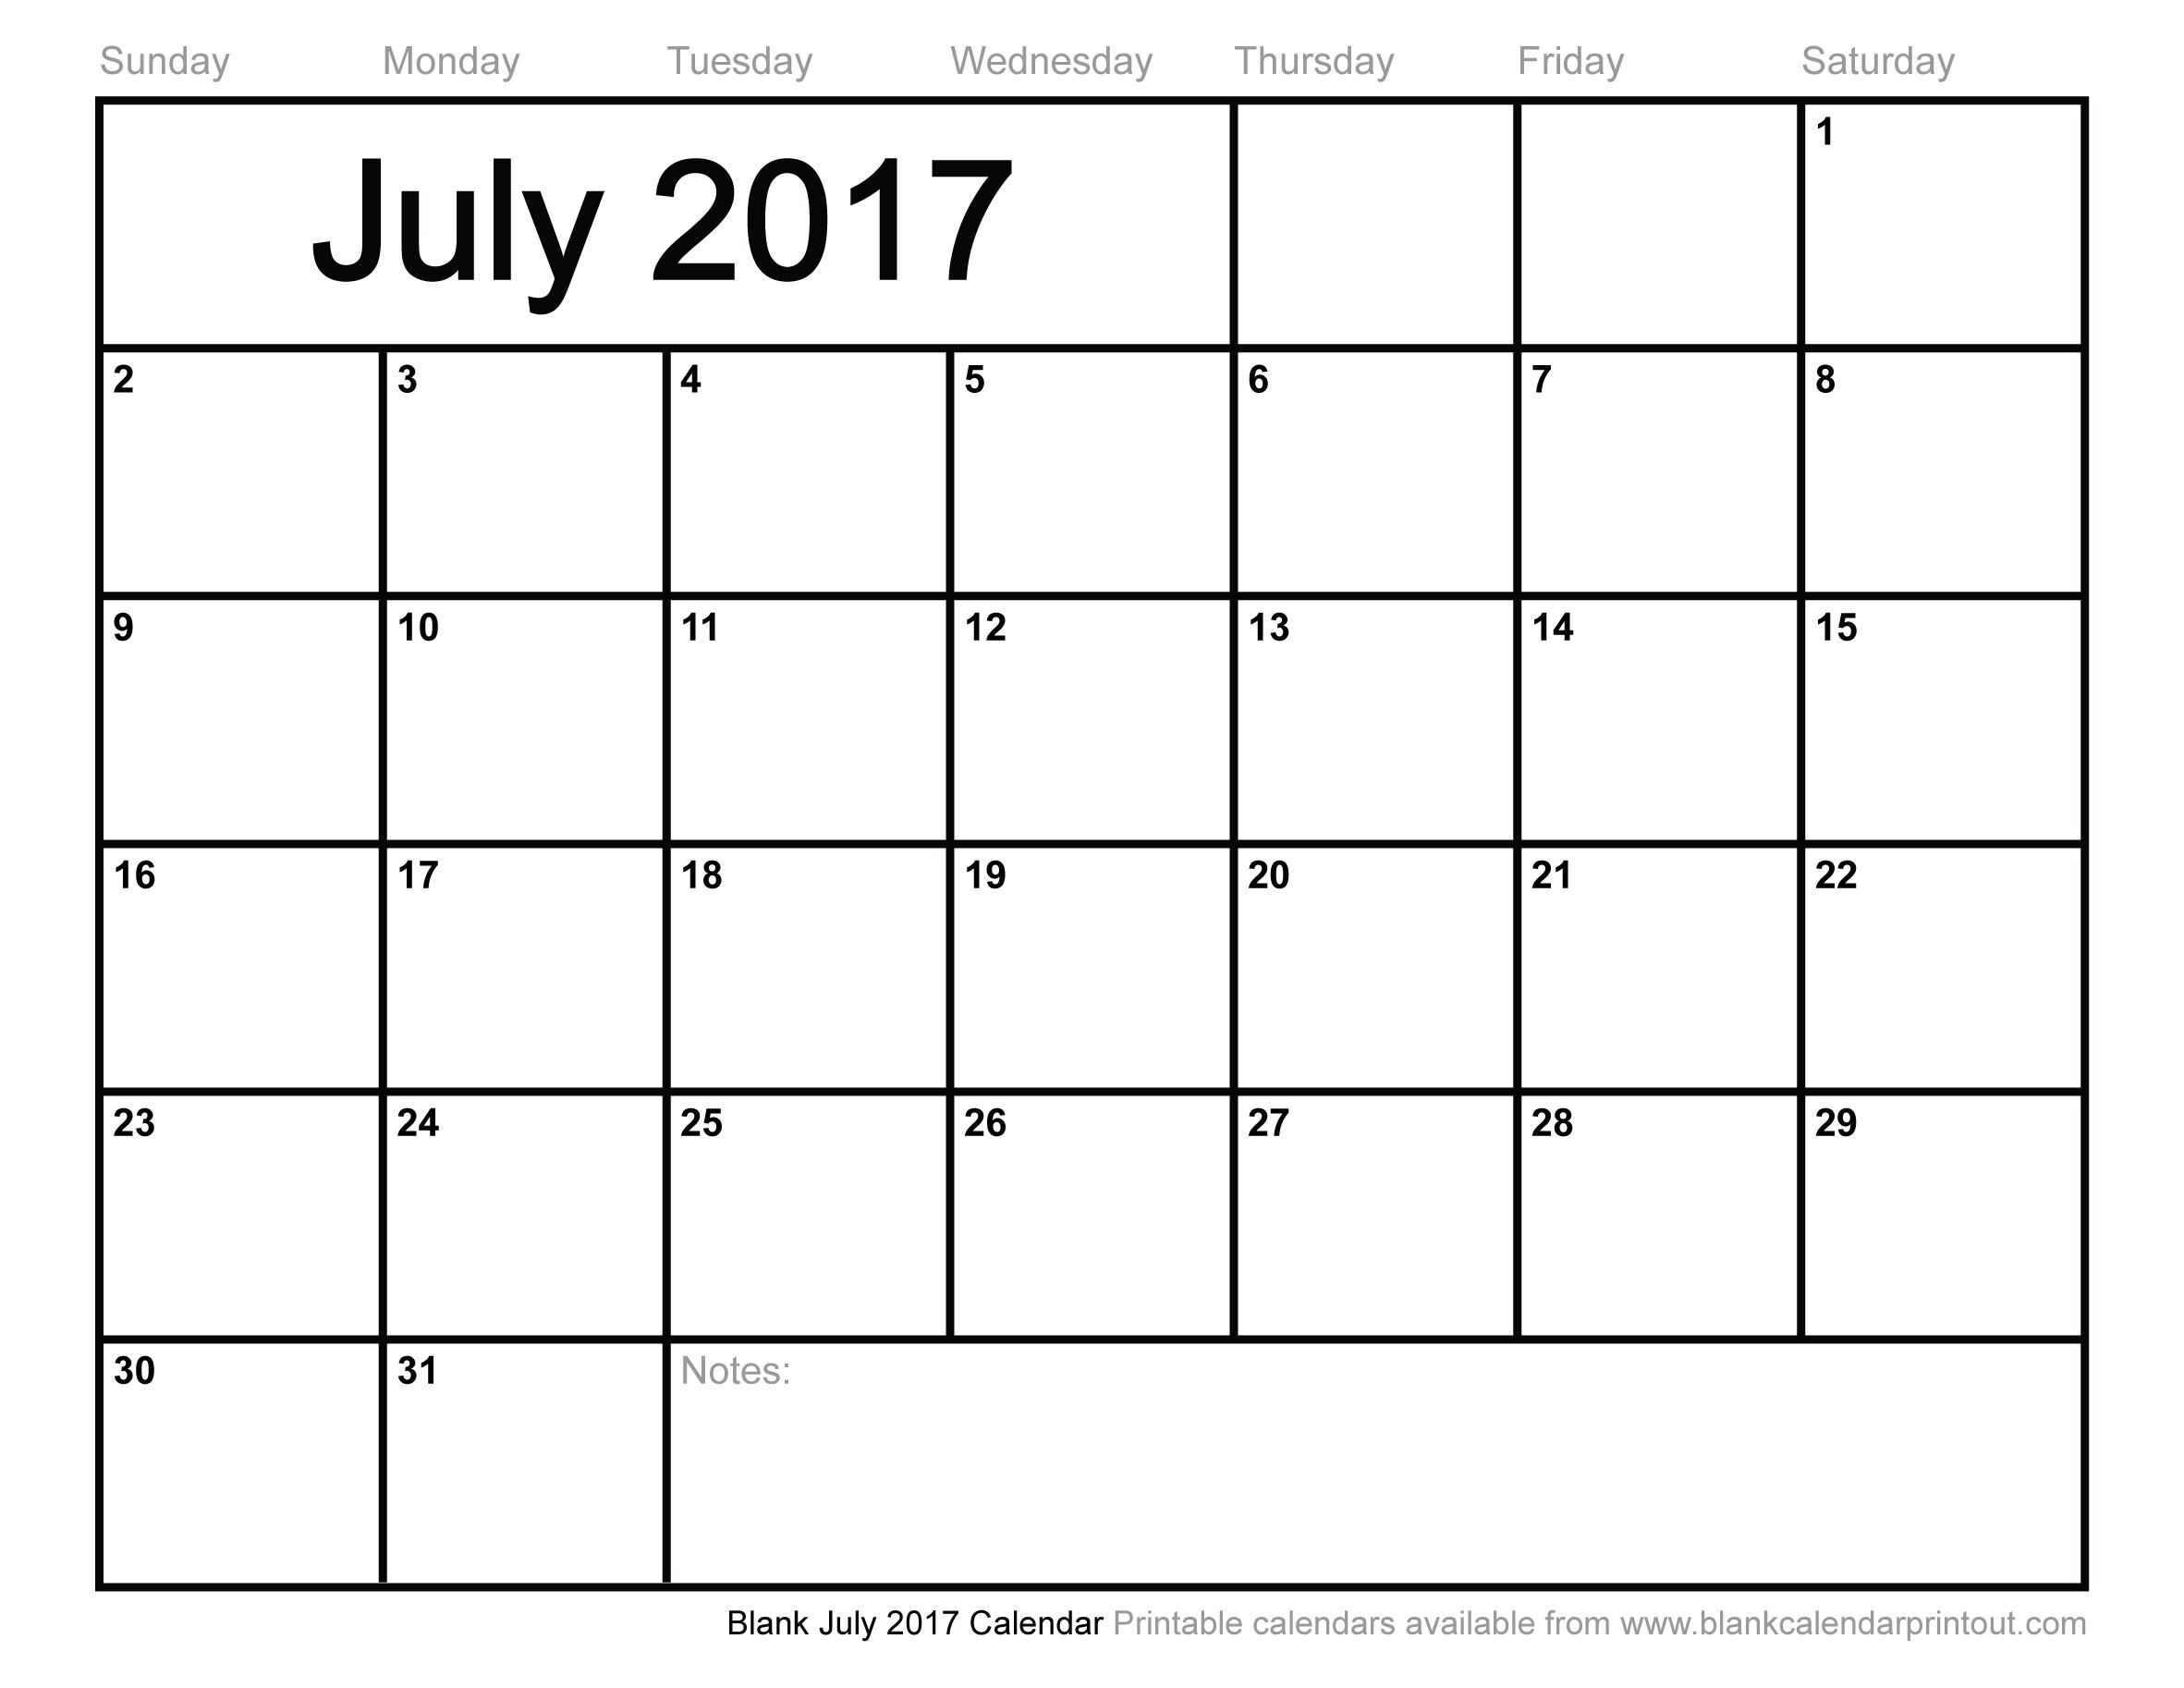 Blank July 2017 Calendar to Print